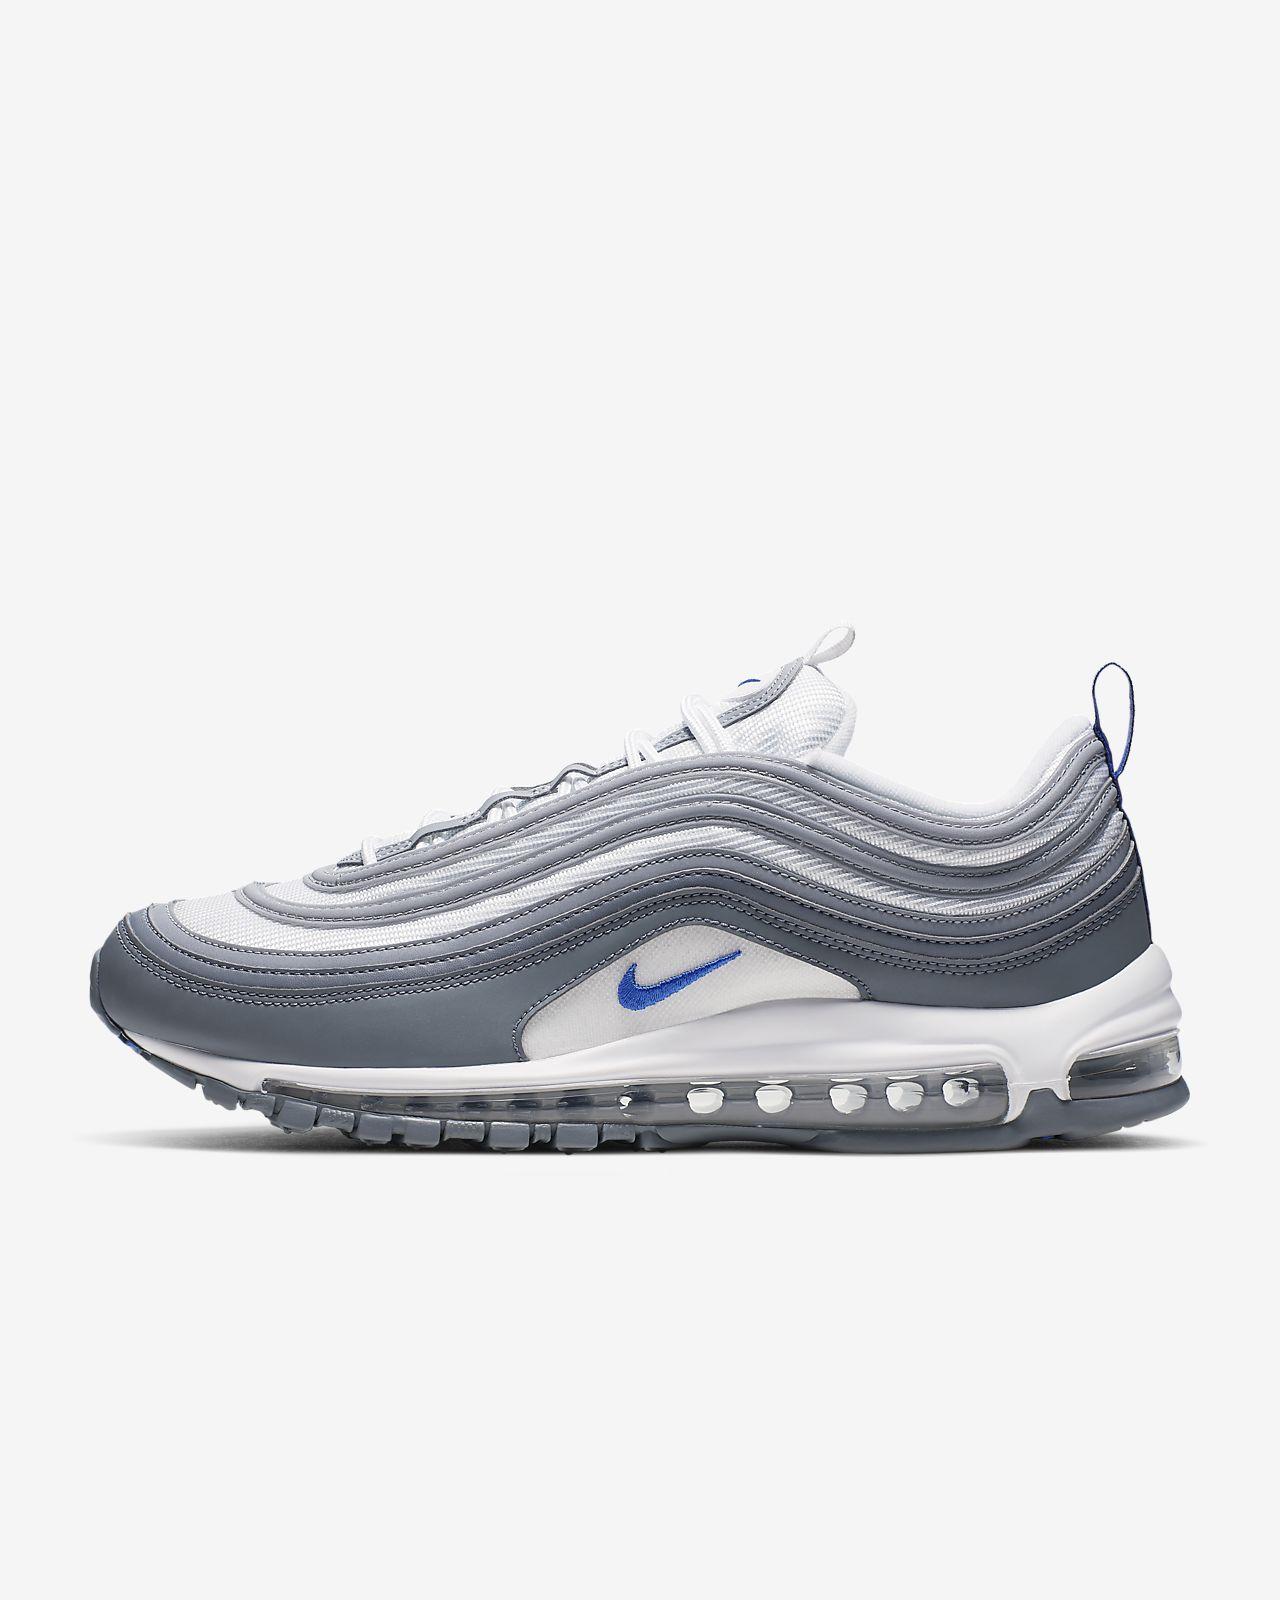 Nike Air Max 97 WhiteHyper Royal Cool Grey Mens Shoes